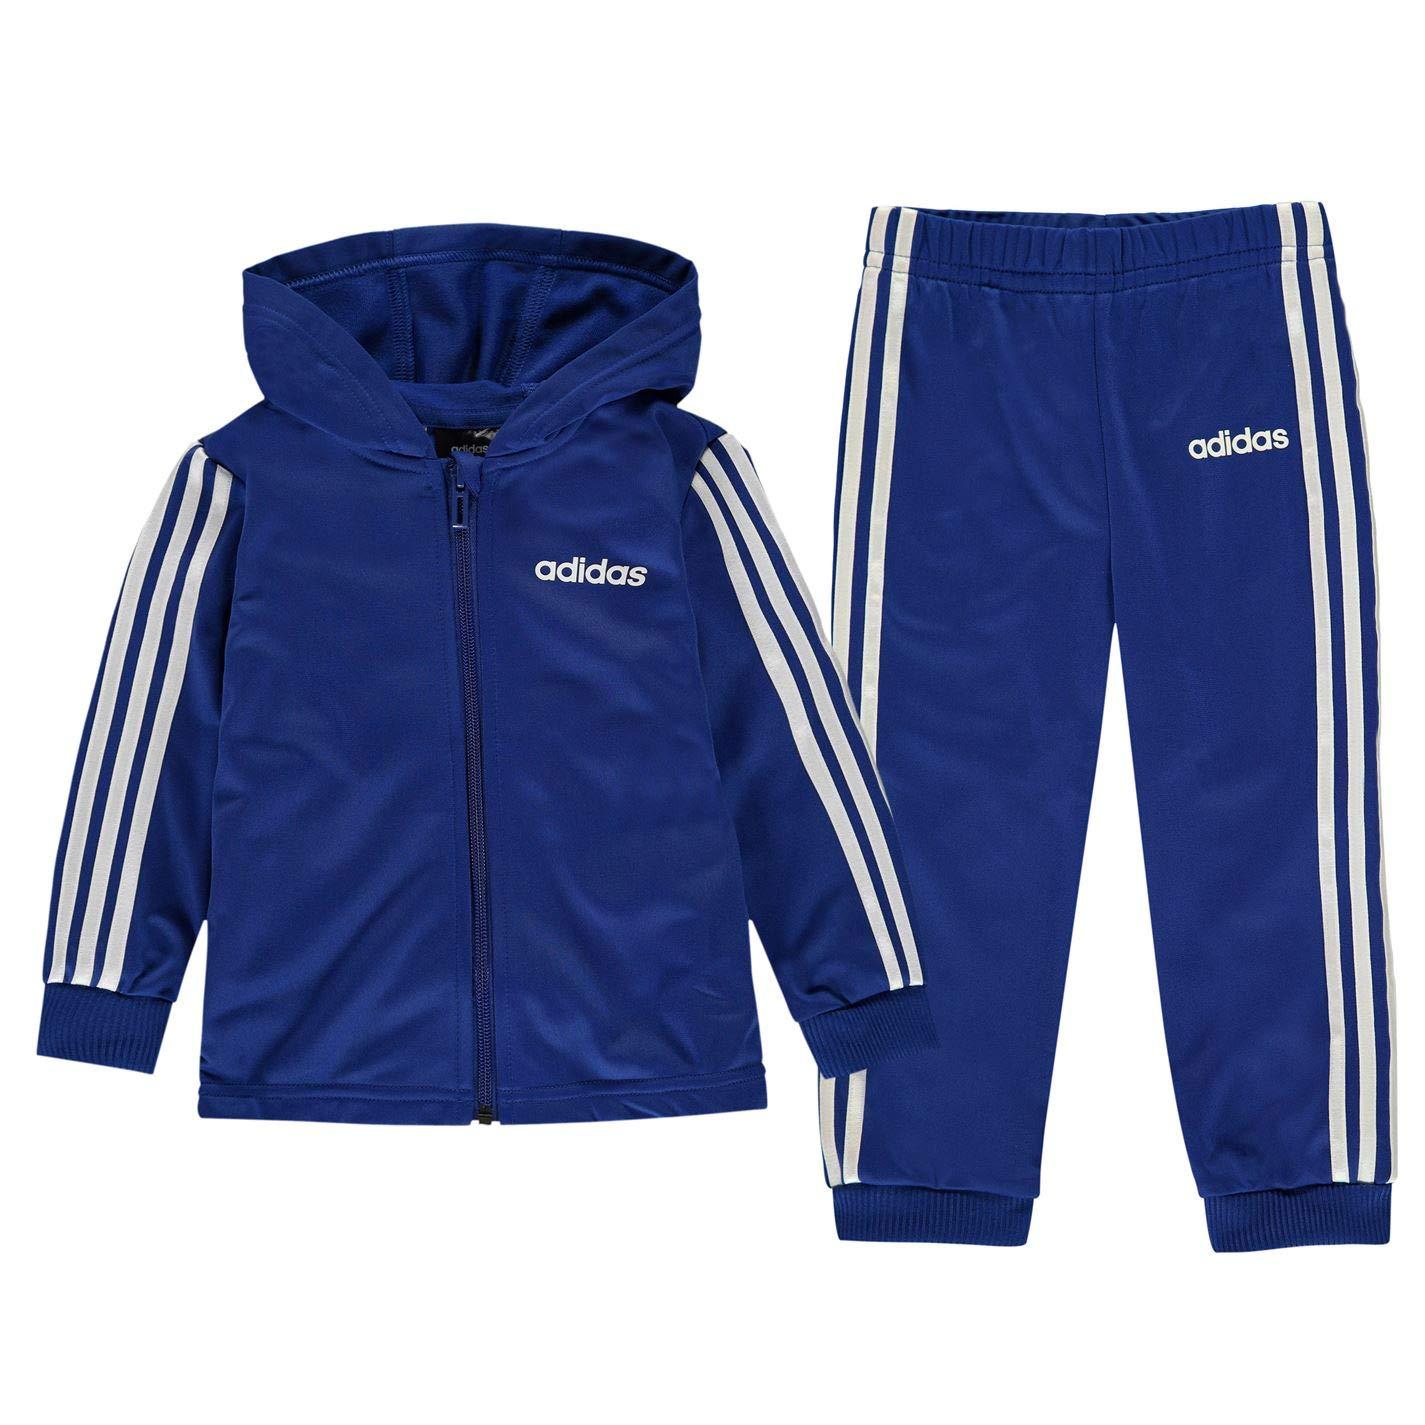 adidas Kids Boys 3 Stripe HD Poly Tracksuit Infant Long